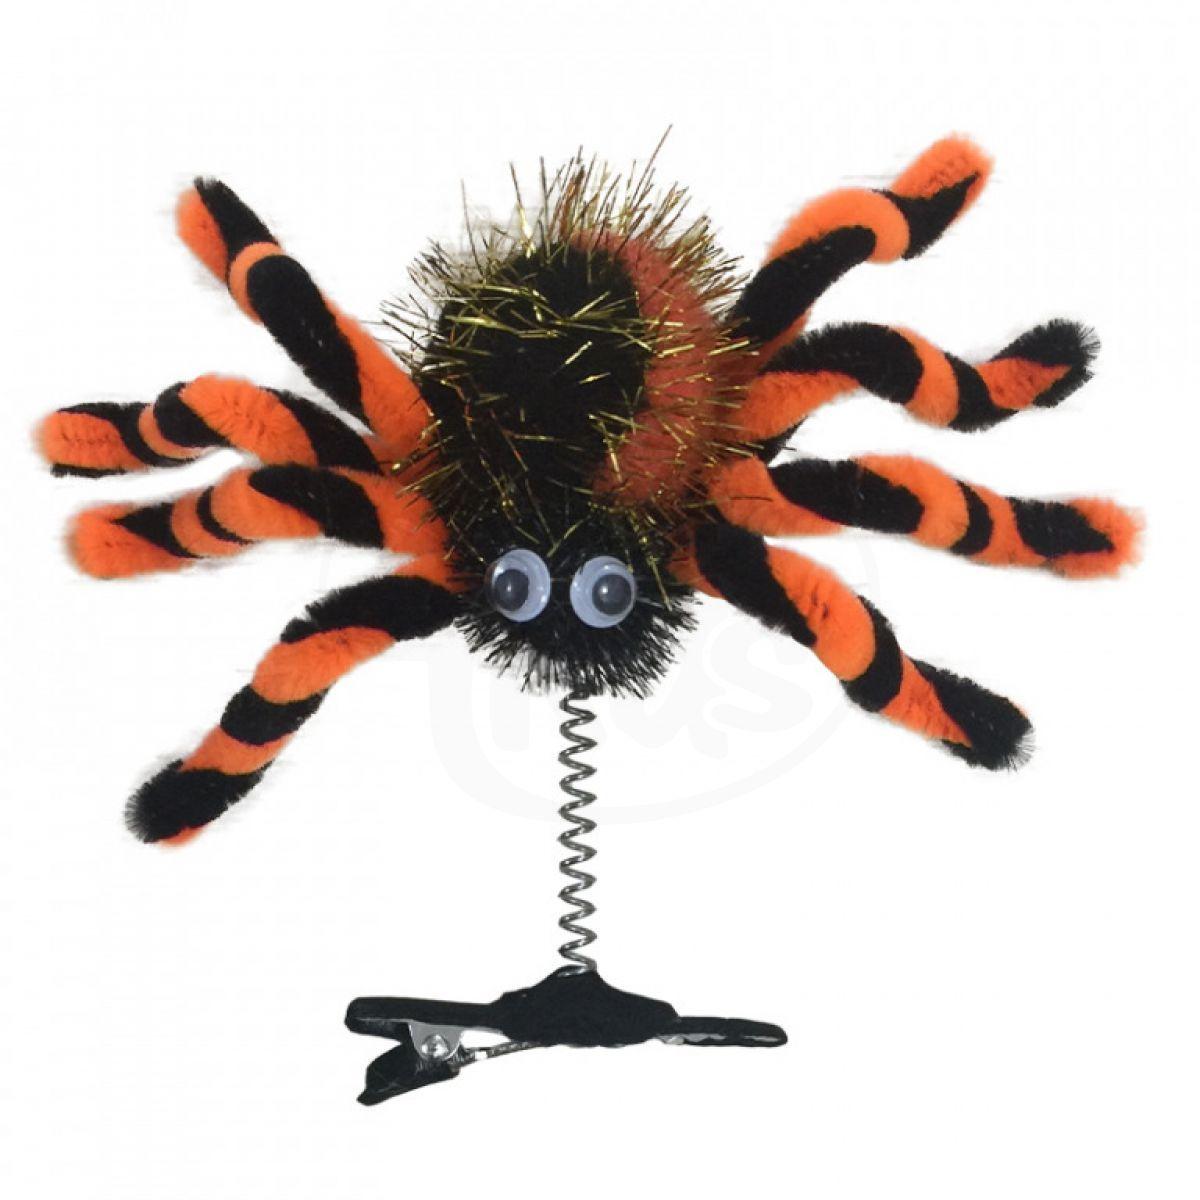 HM Studio Spona do vlasů pavouk 06eb15e476